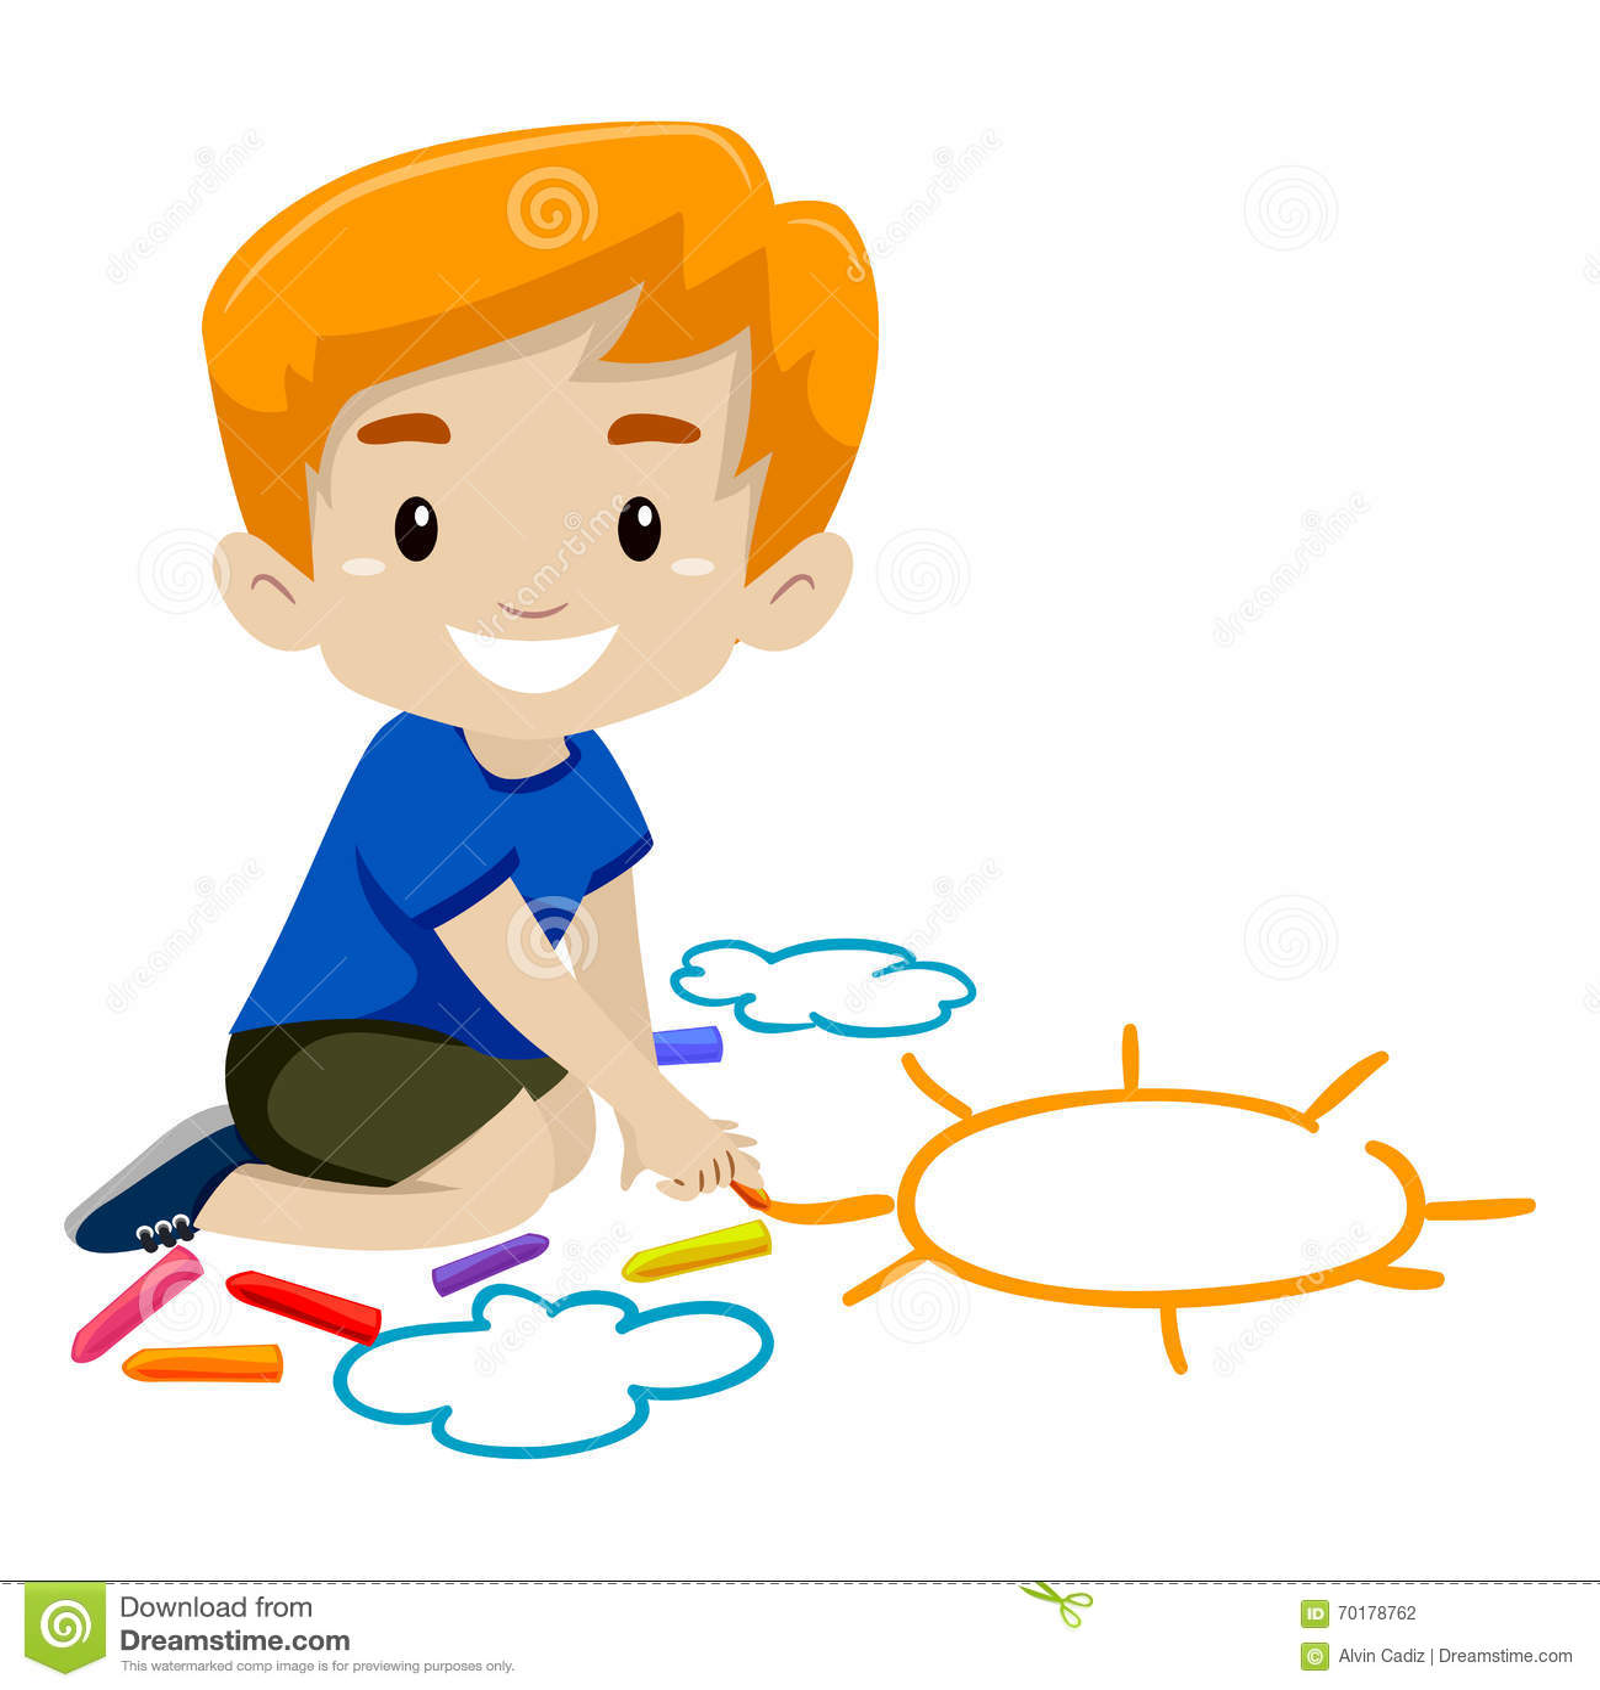 little boy drawing a sun using chalk stock vector illustration of rh dreamstime com Chalk Banner Chalk Banner